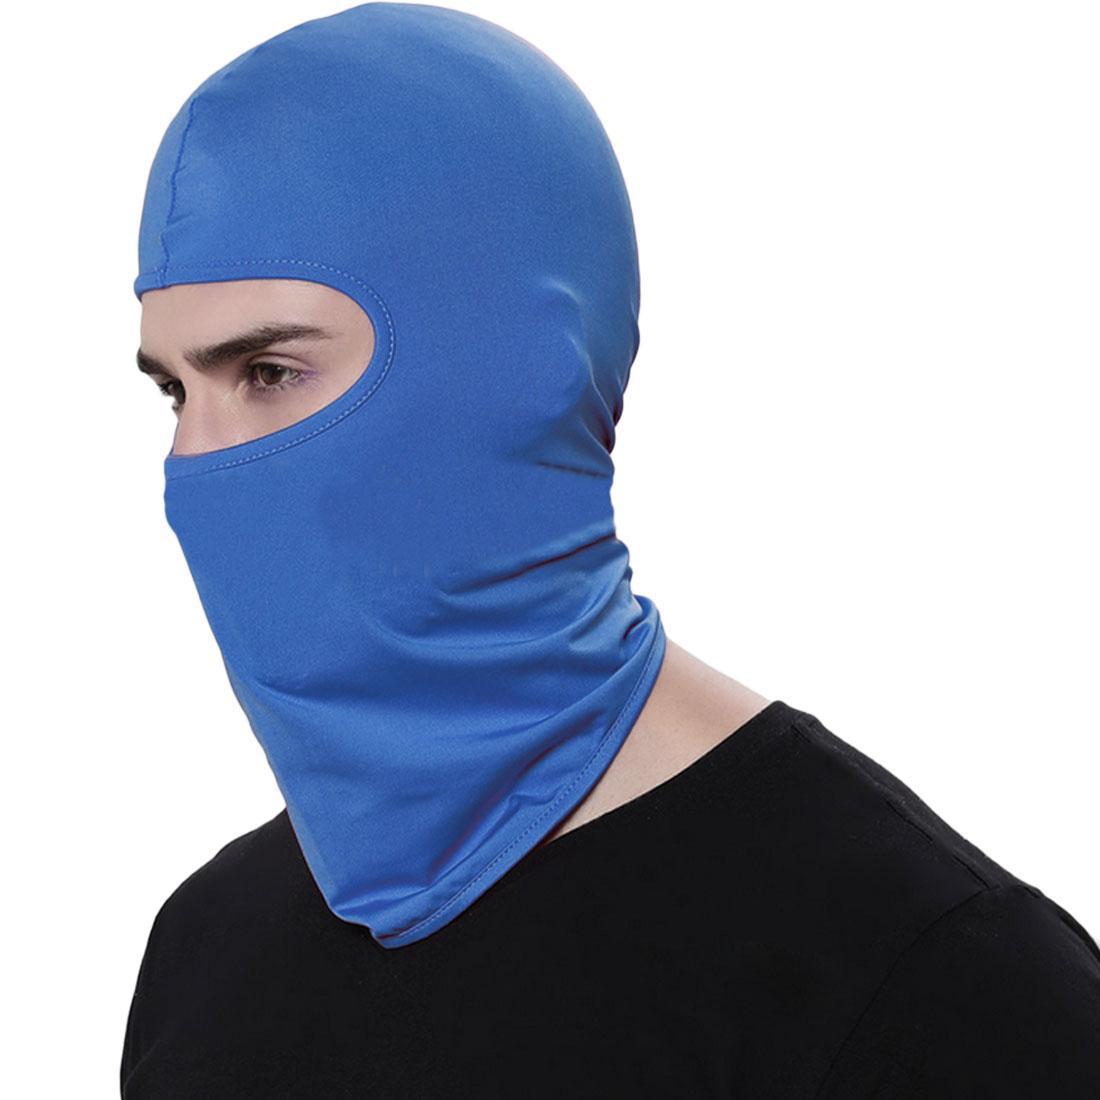 Klikoto Balaclava Masker Motor / Sepeda / Olah Raga Full Face / Sarung Kepala Helm Model